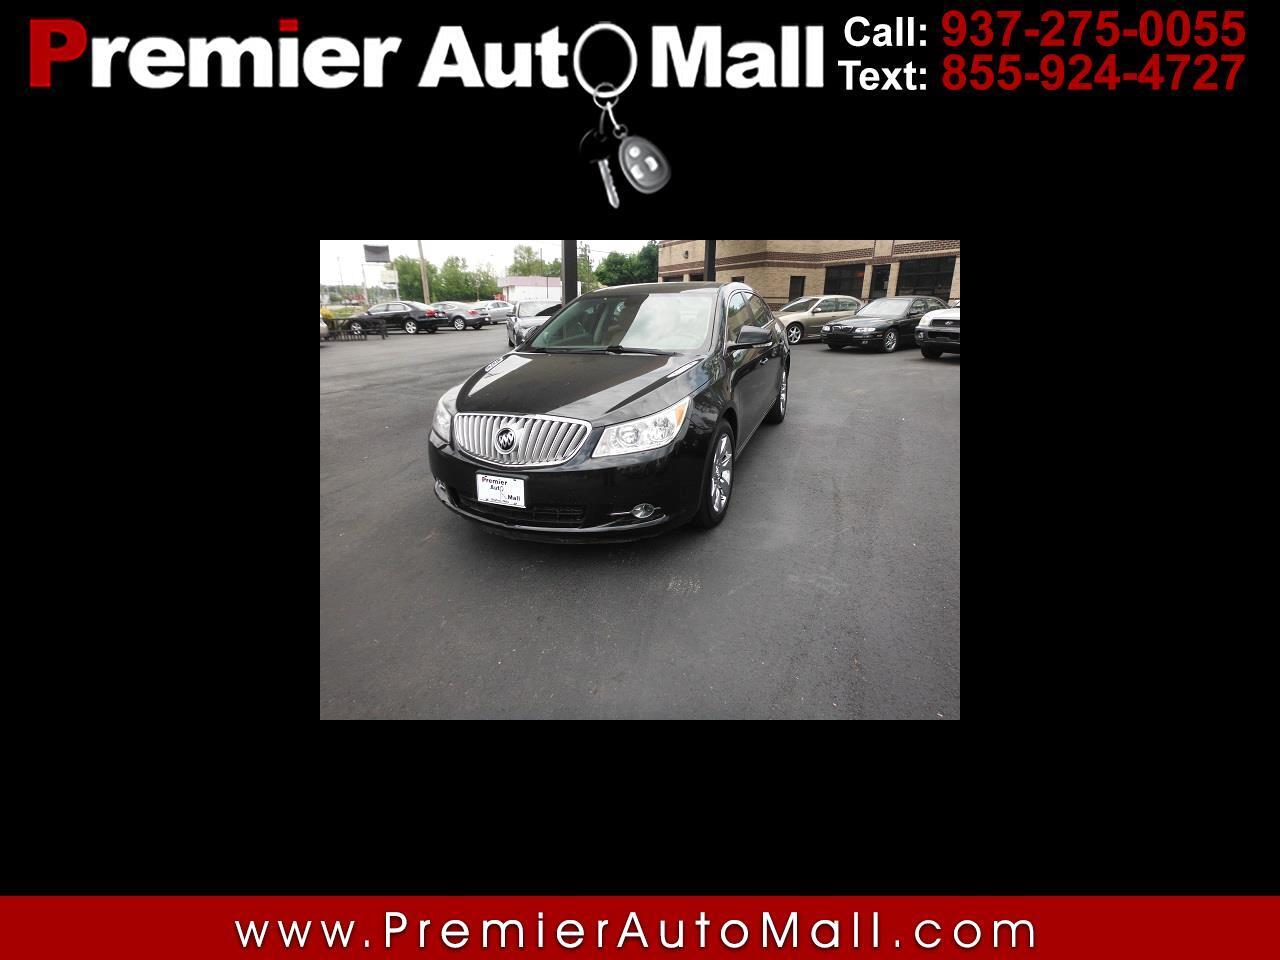 Buick LaCrosse 4dr Sdn CXL 3.0L AWD 2010